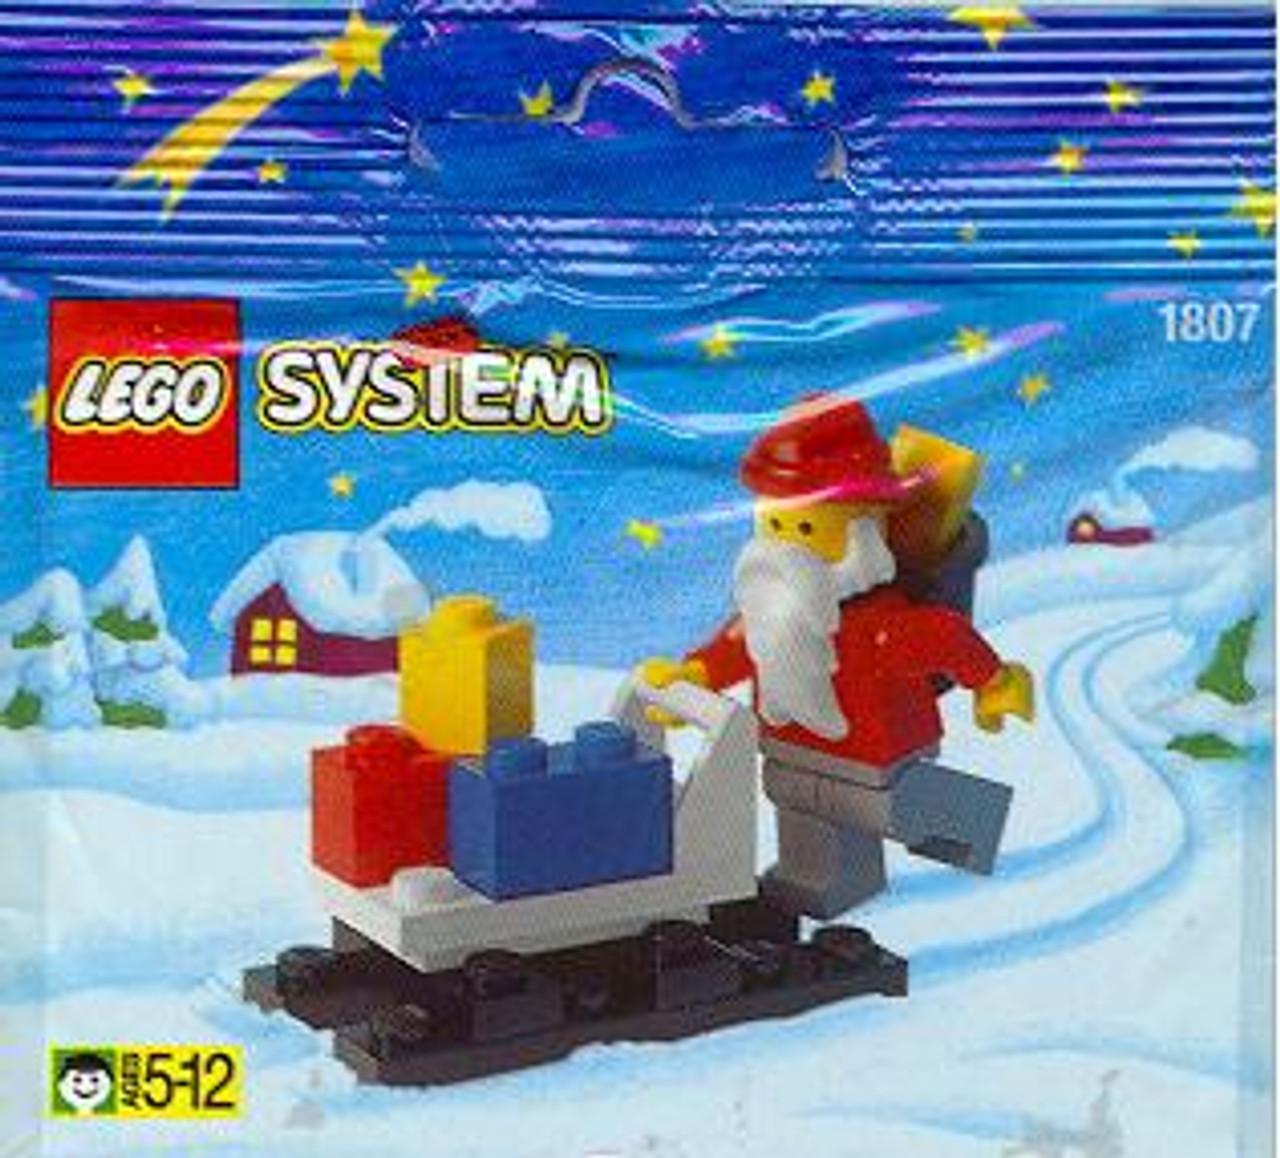 LEGO System Santa Claus & Sleigh Mini Set #1807 [Bagged]